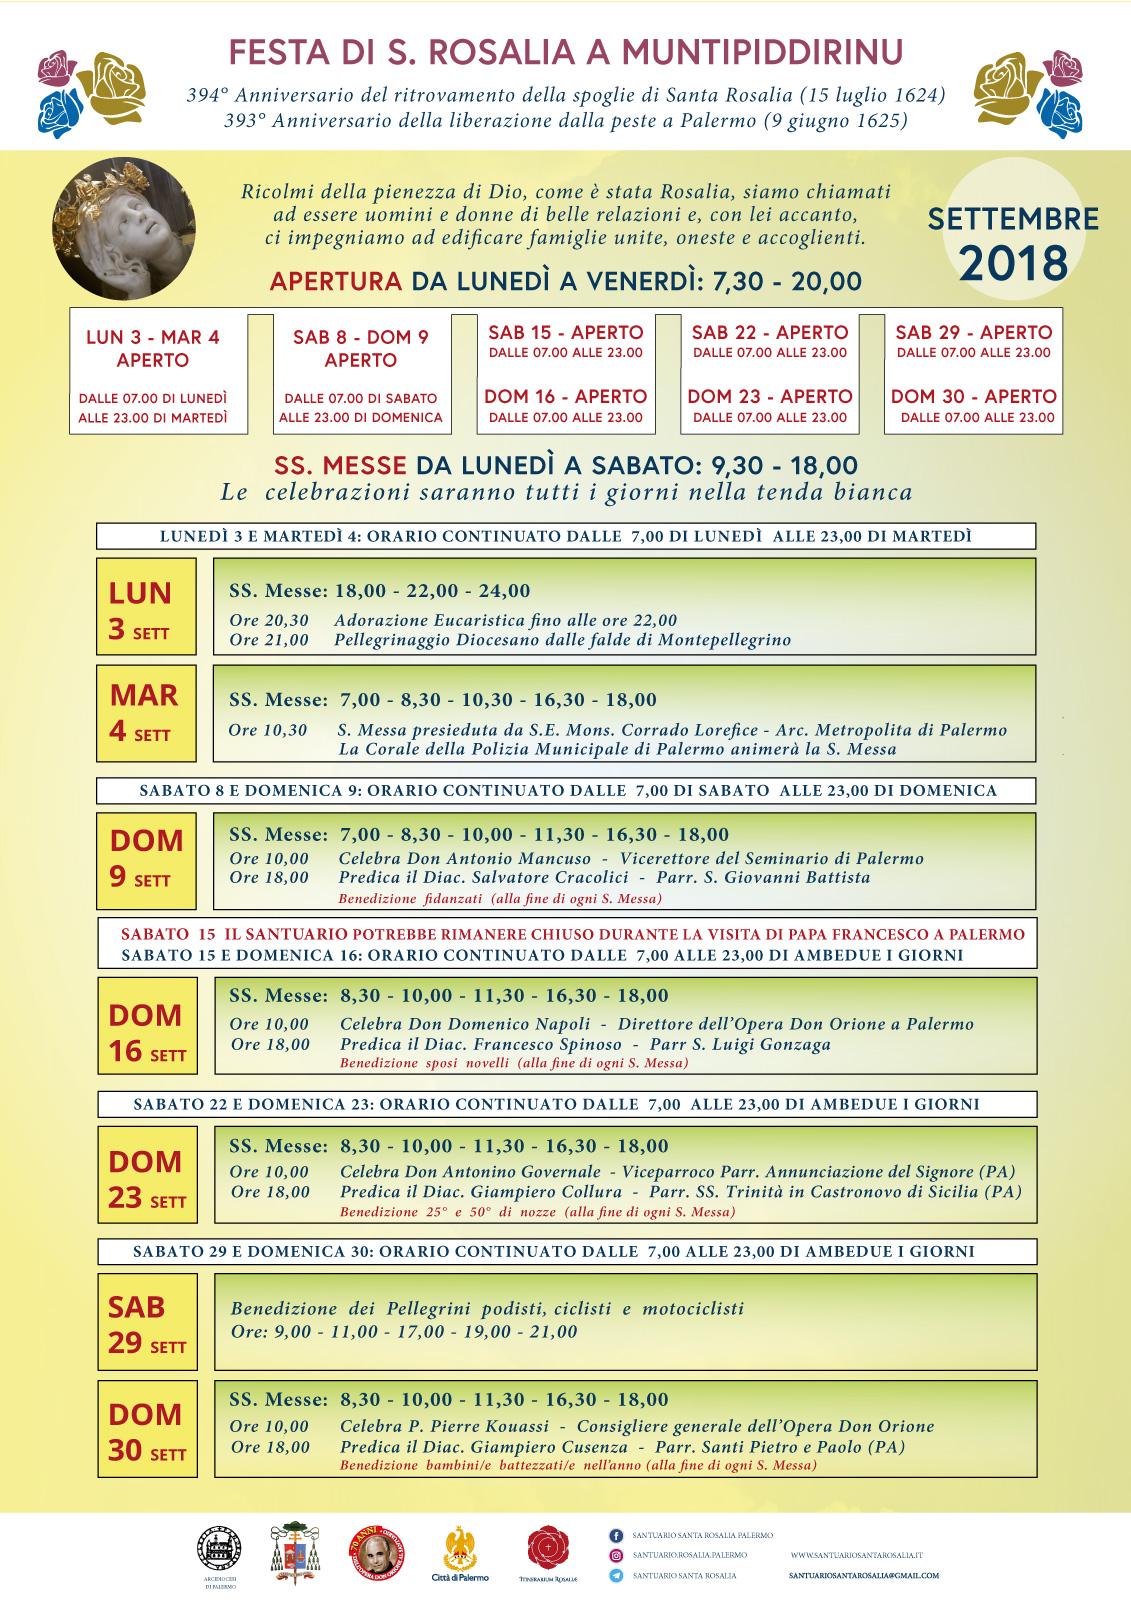 Programma Festa Rosalia 2018 26 AGOSTO